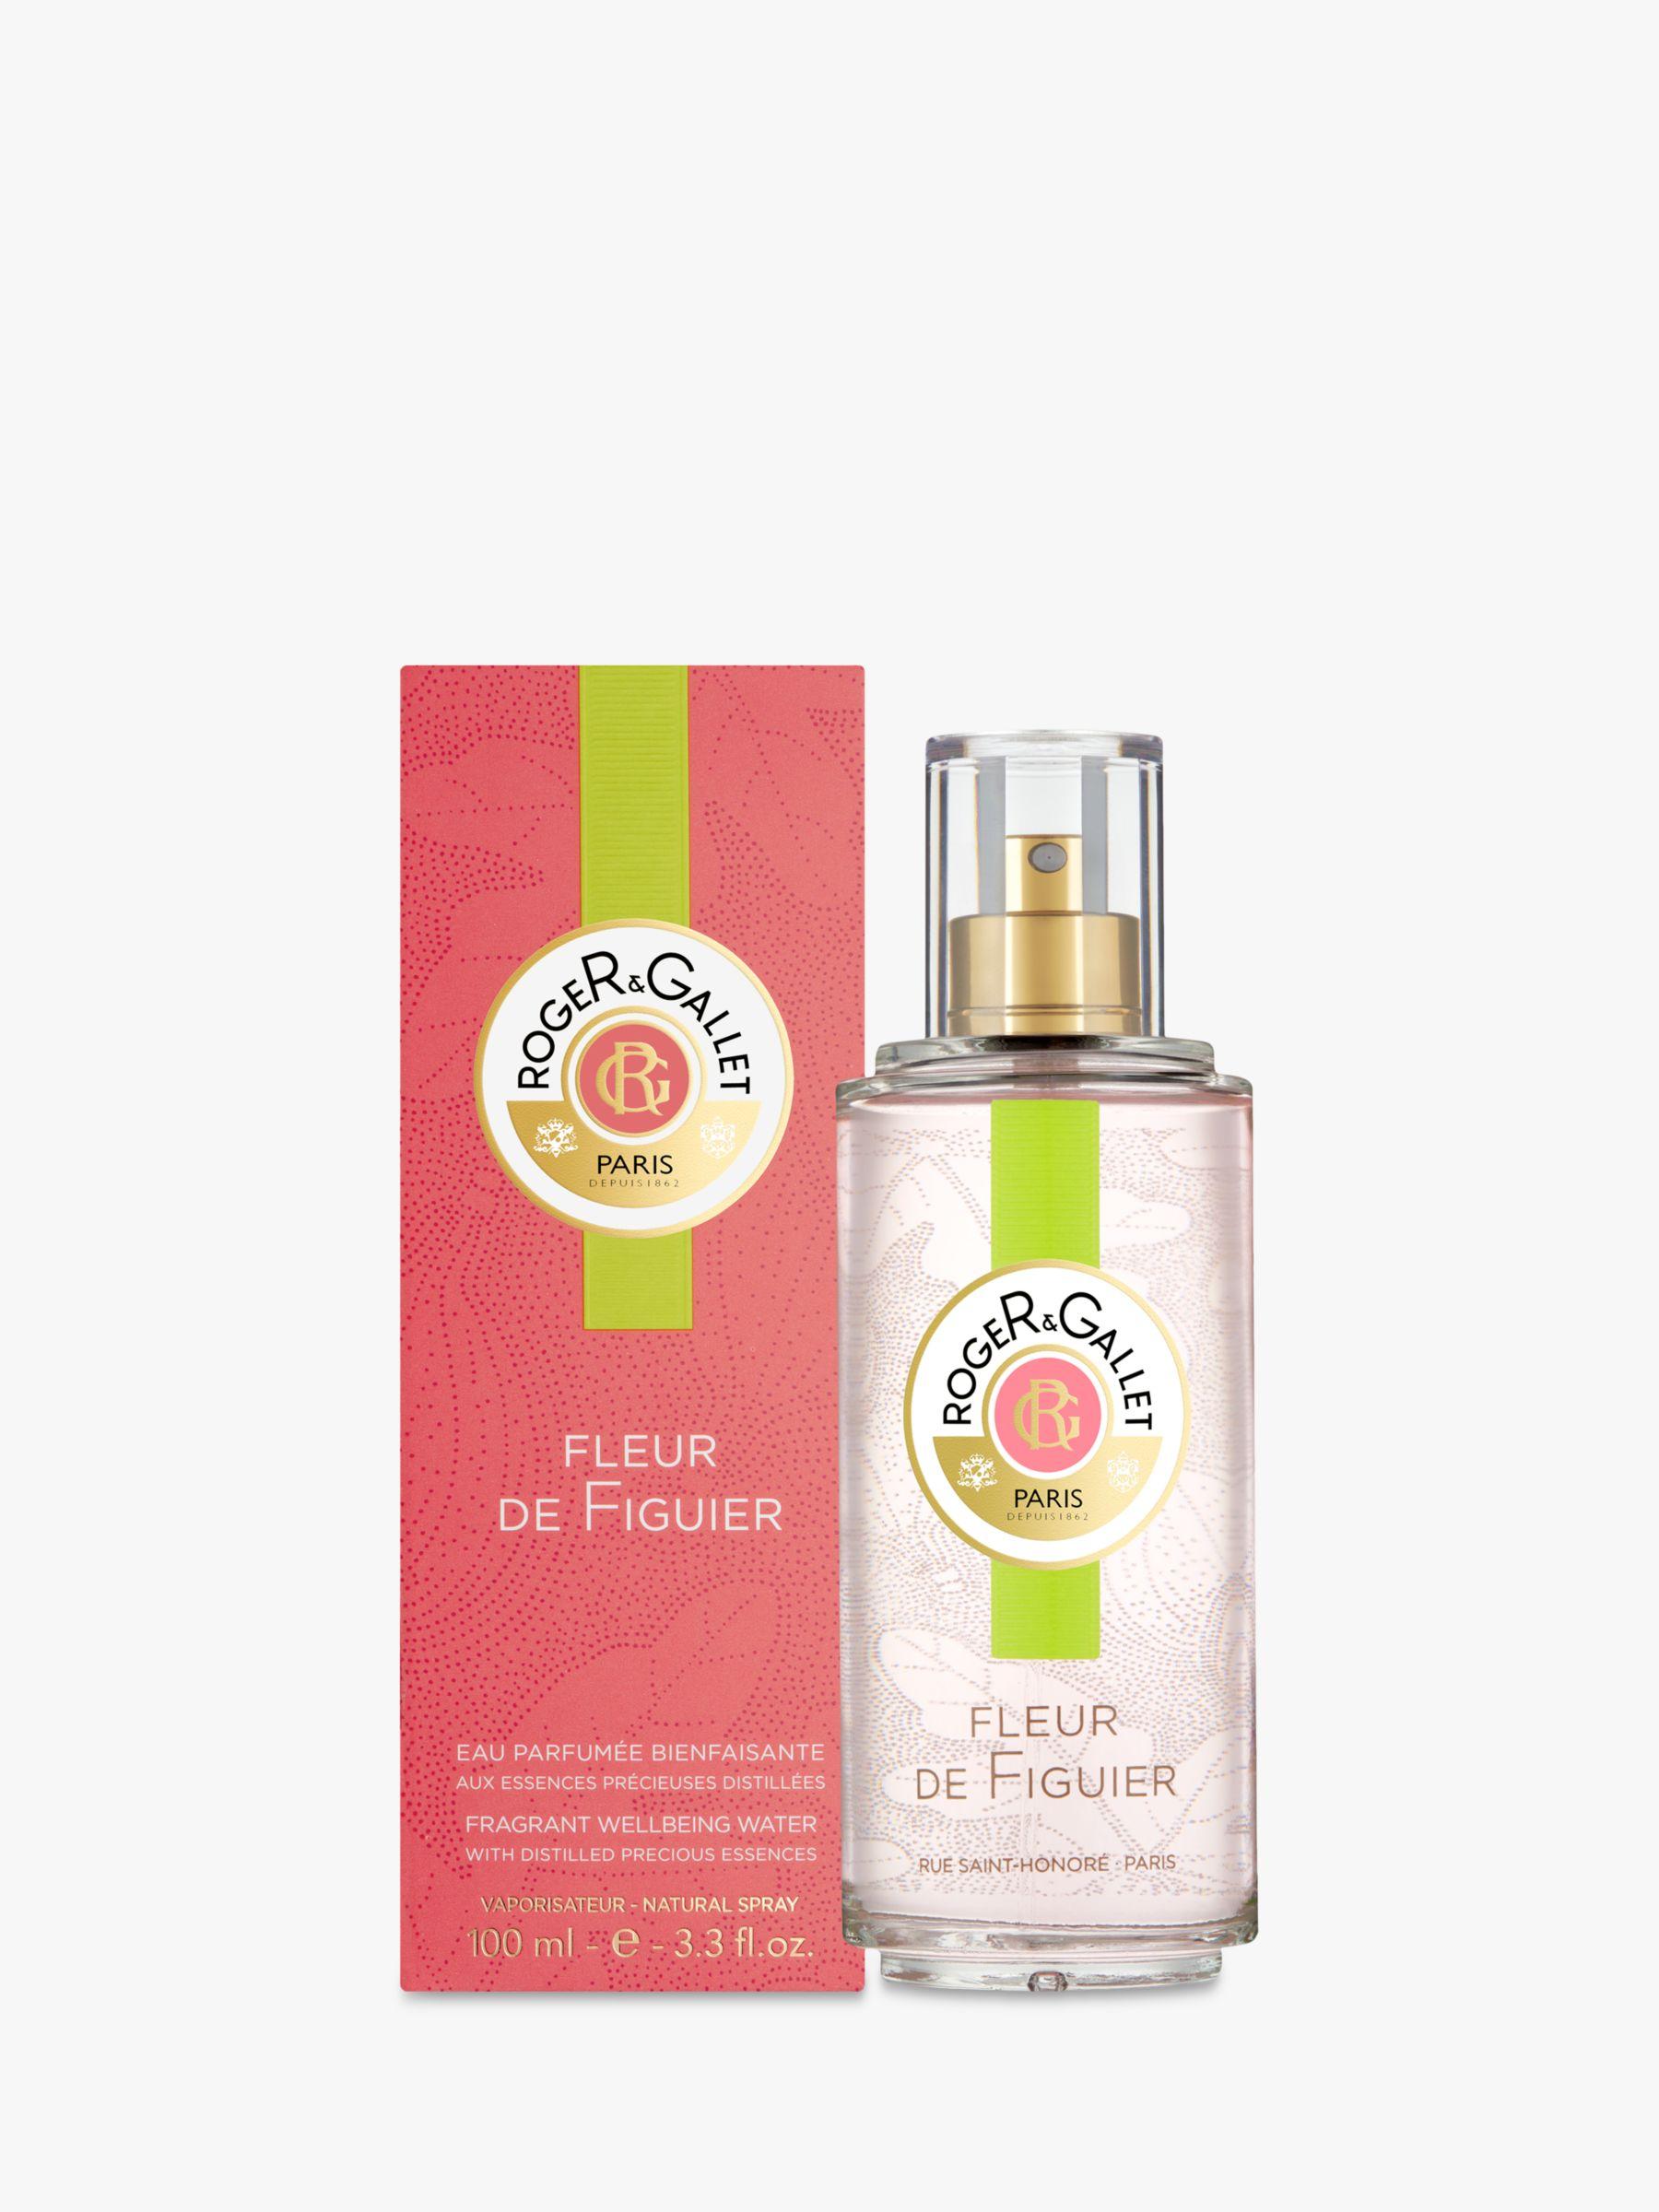 Roger & Gallet Roger & Gallet Fleur de Figuier Well-Being Water Fragrance, 100ml